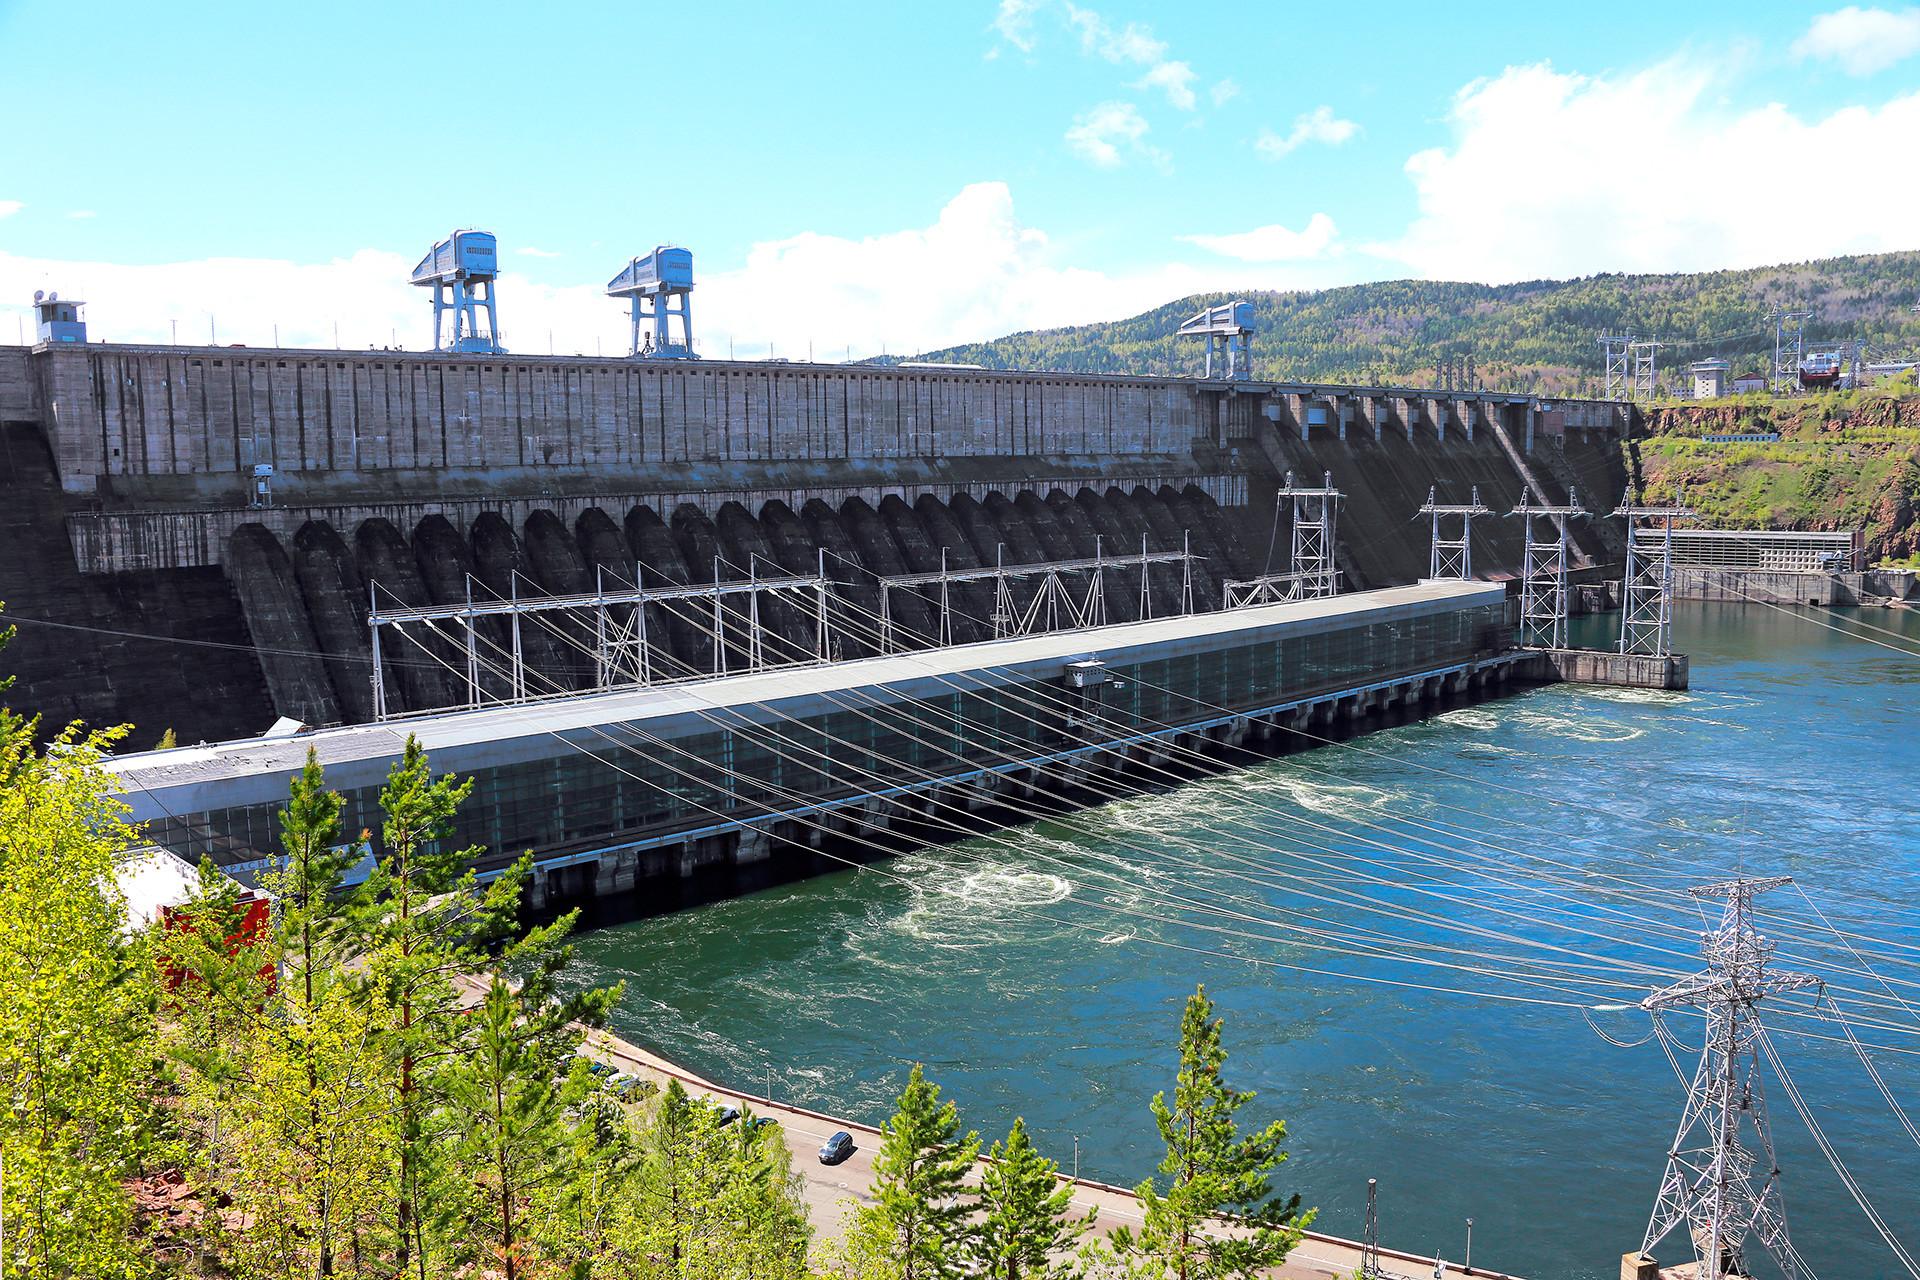 Das Wasserkraftwerk am Jenissej in Diwnogorsk bei Krasnojarsk